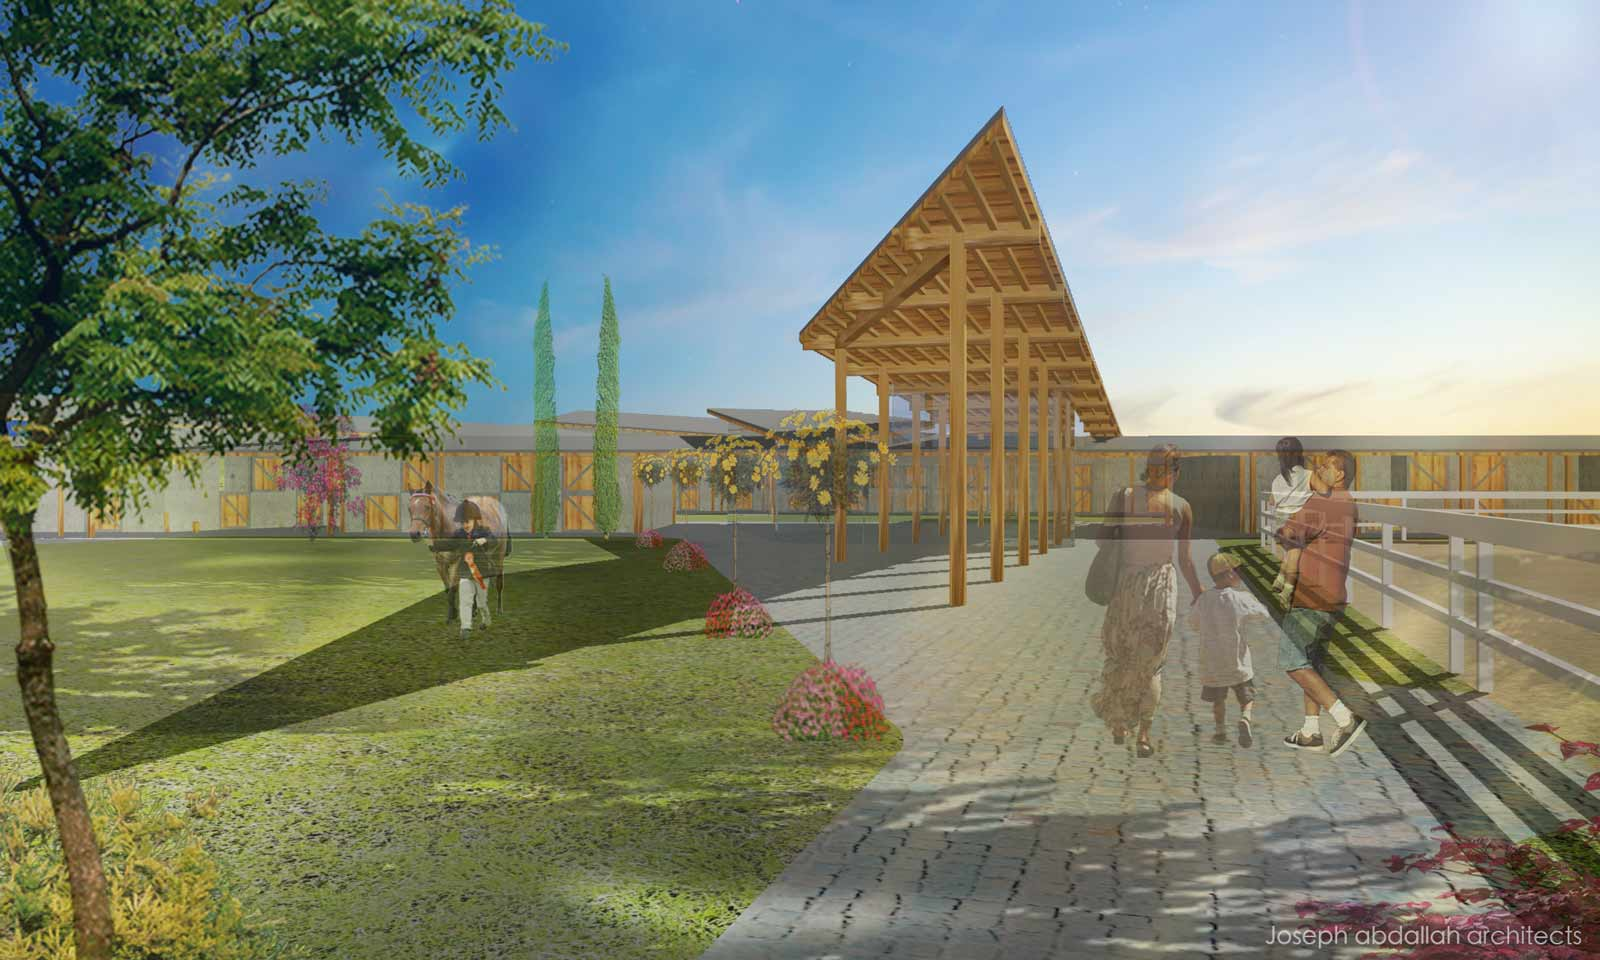 hechmi-equestrian-horse-back-riding-sport-lebanon-joseph-abdallah-architects-3